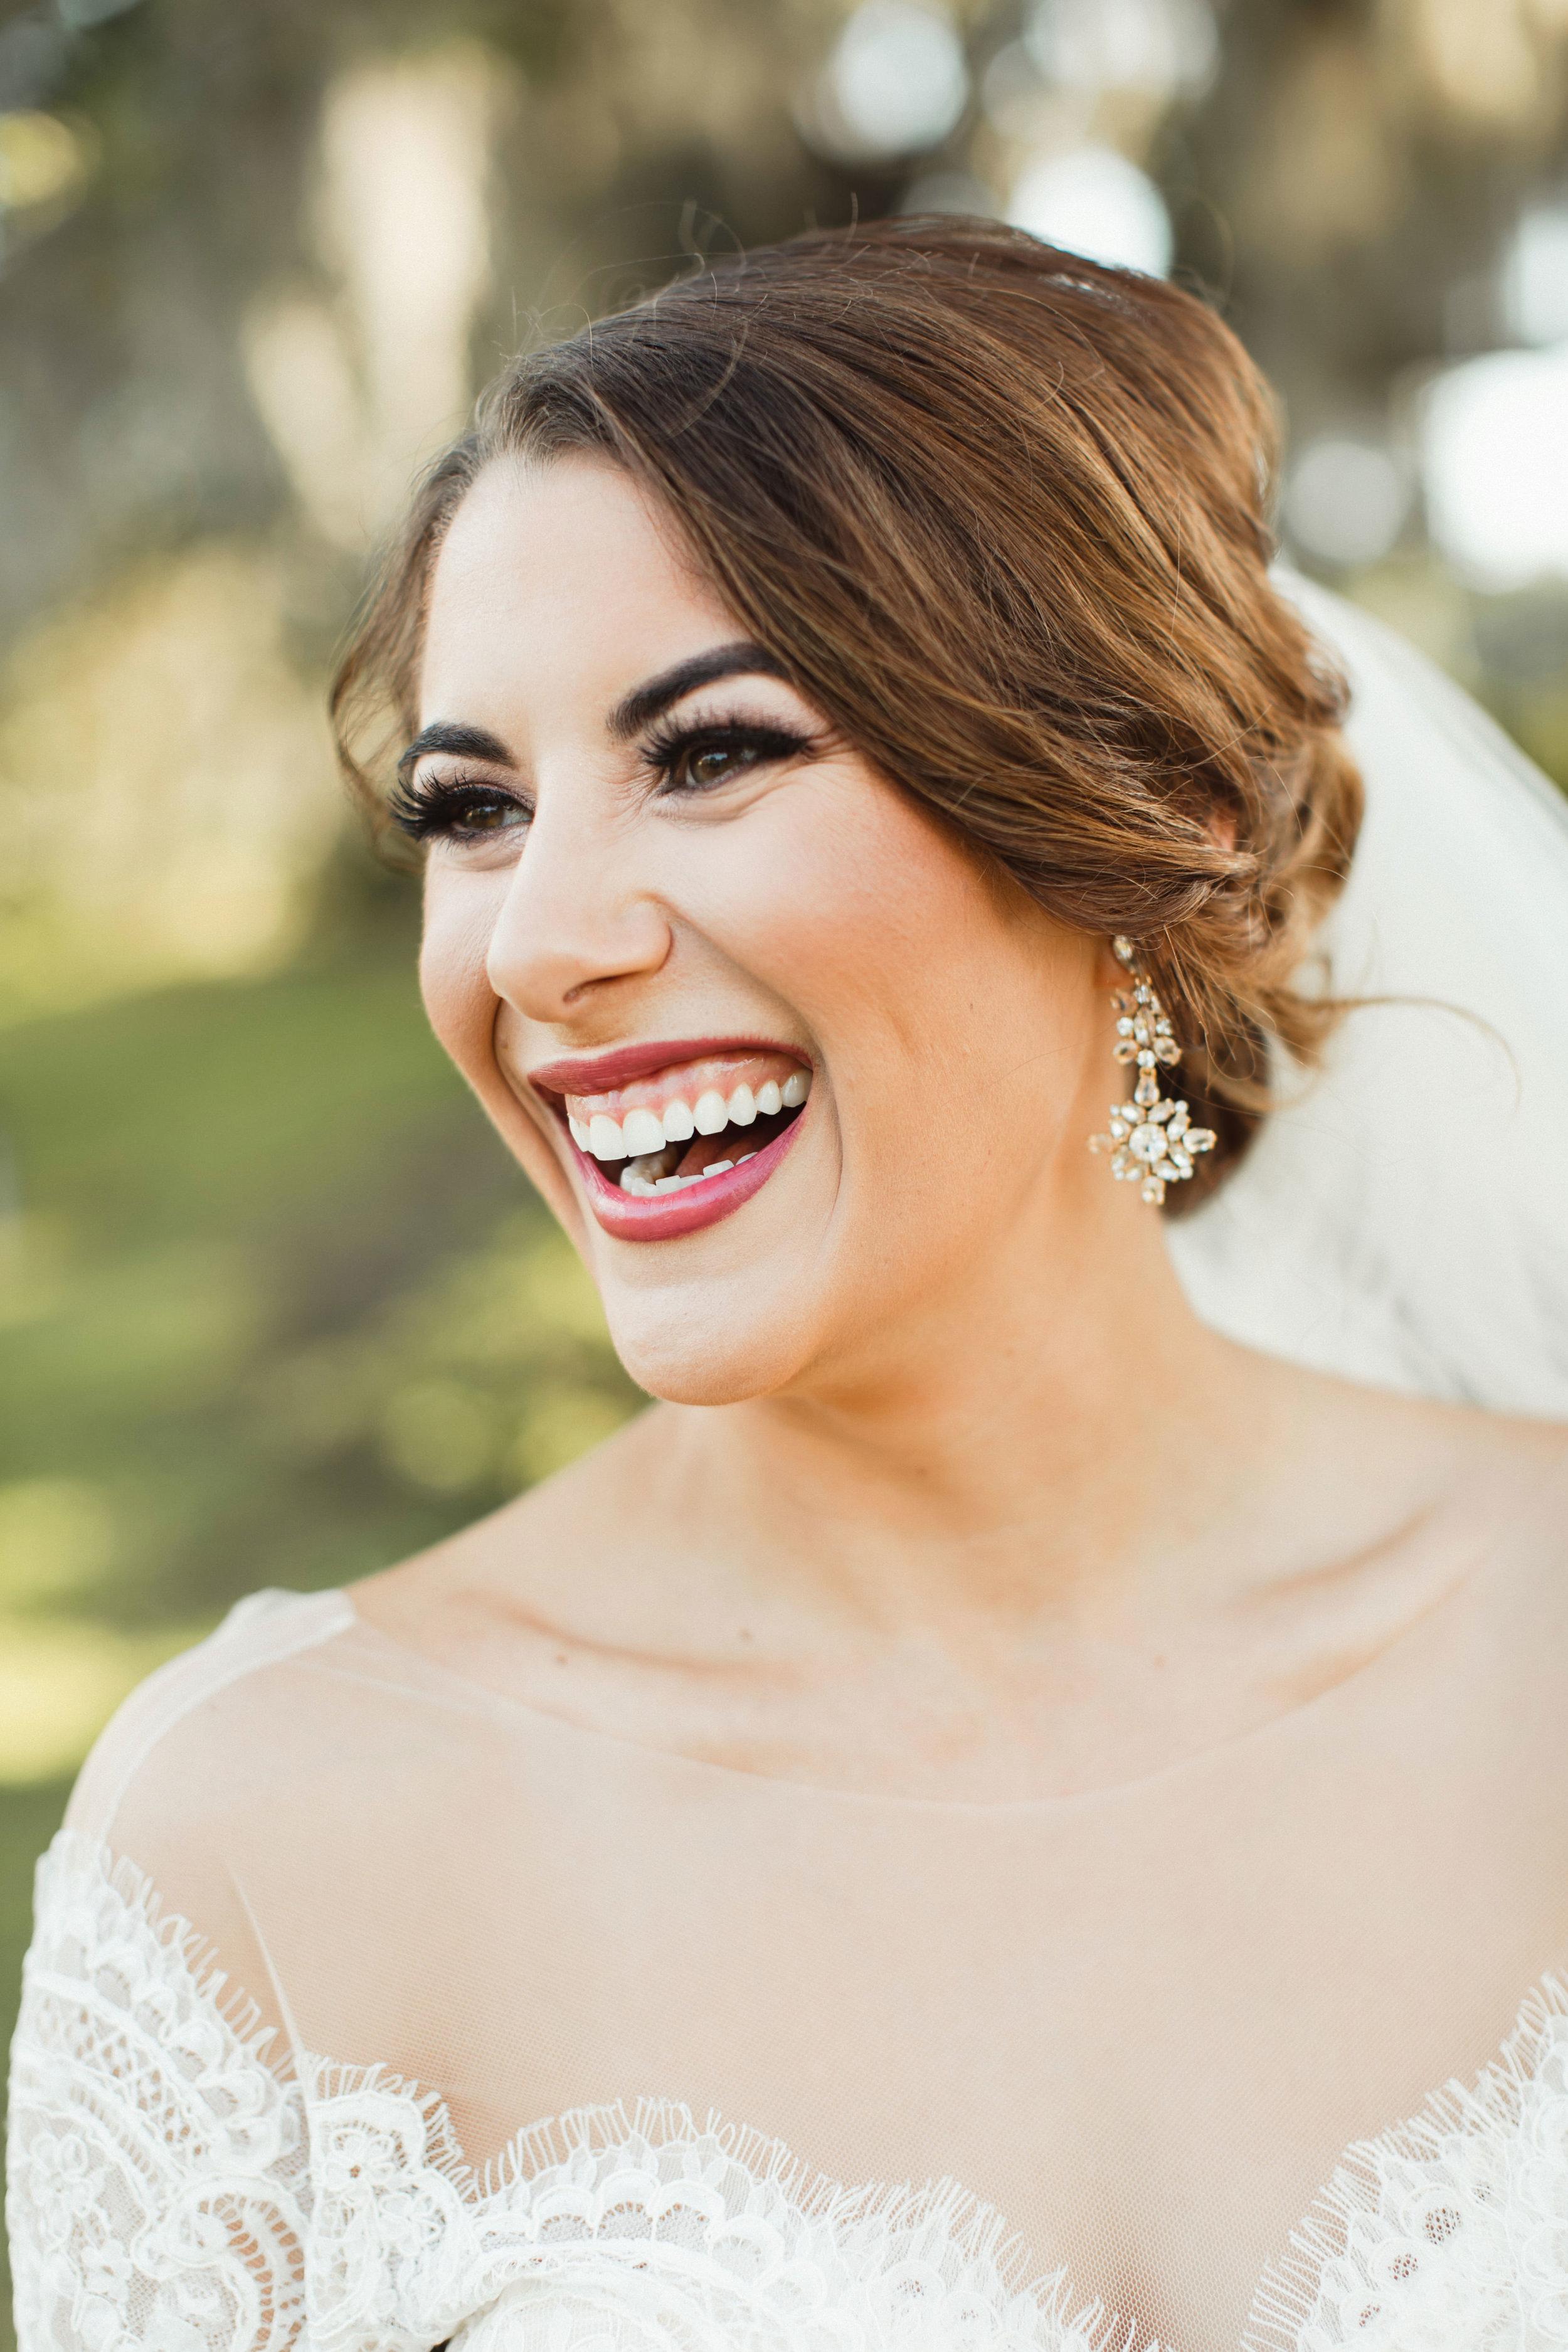 Southern Fete, Southern Wedding, Bride, Kimbrali Photography